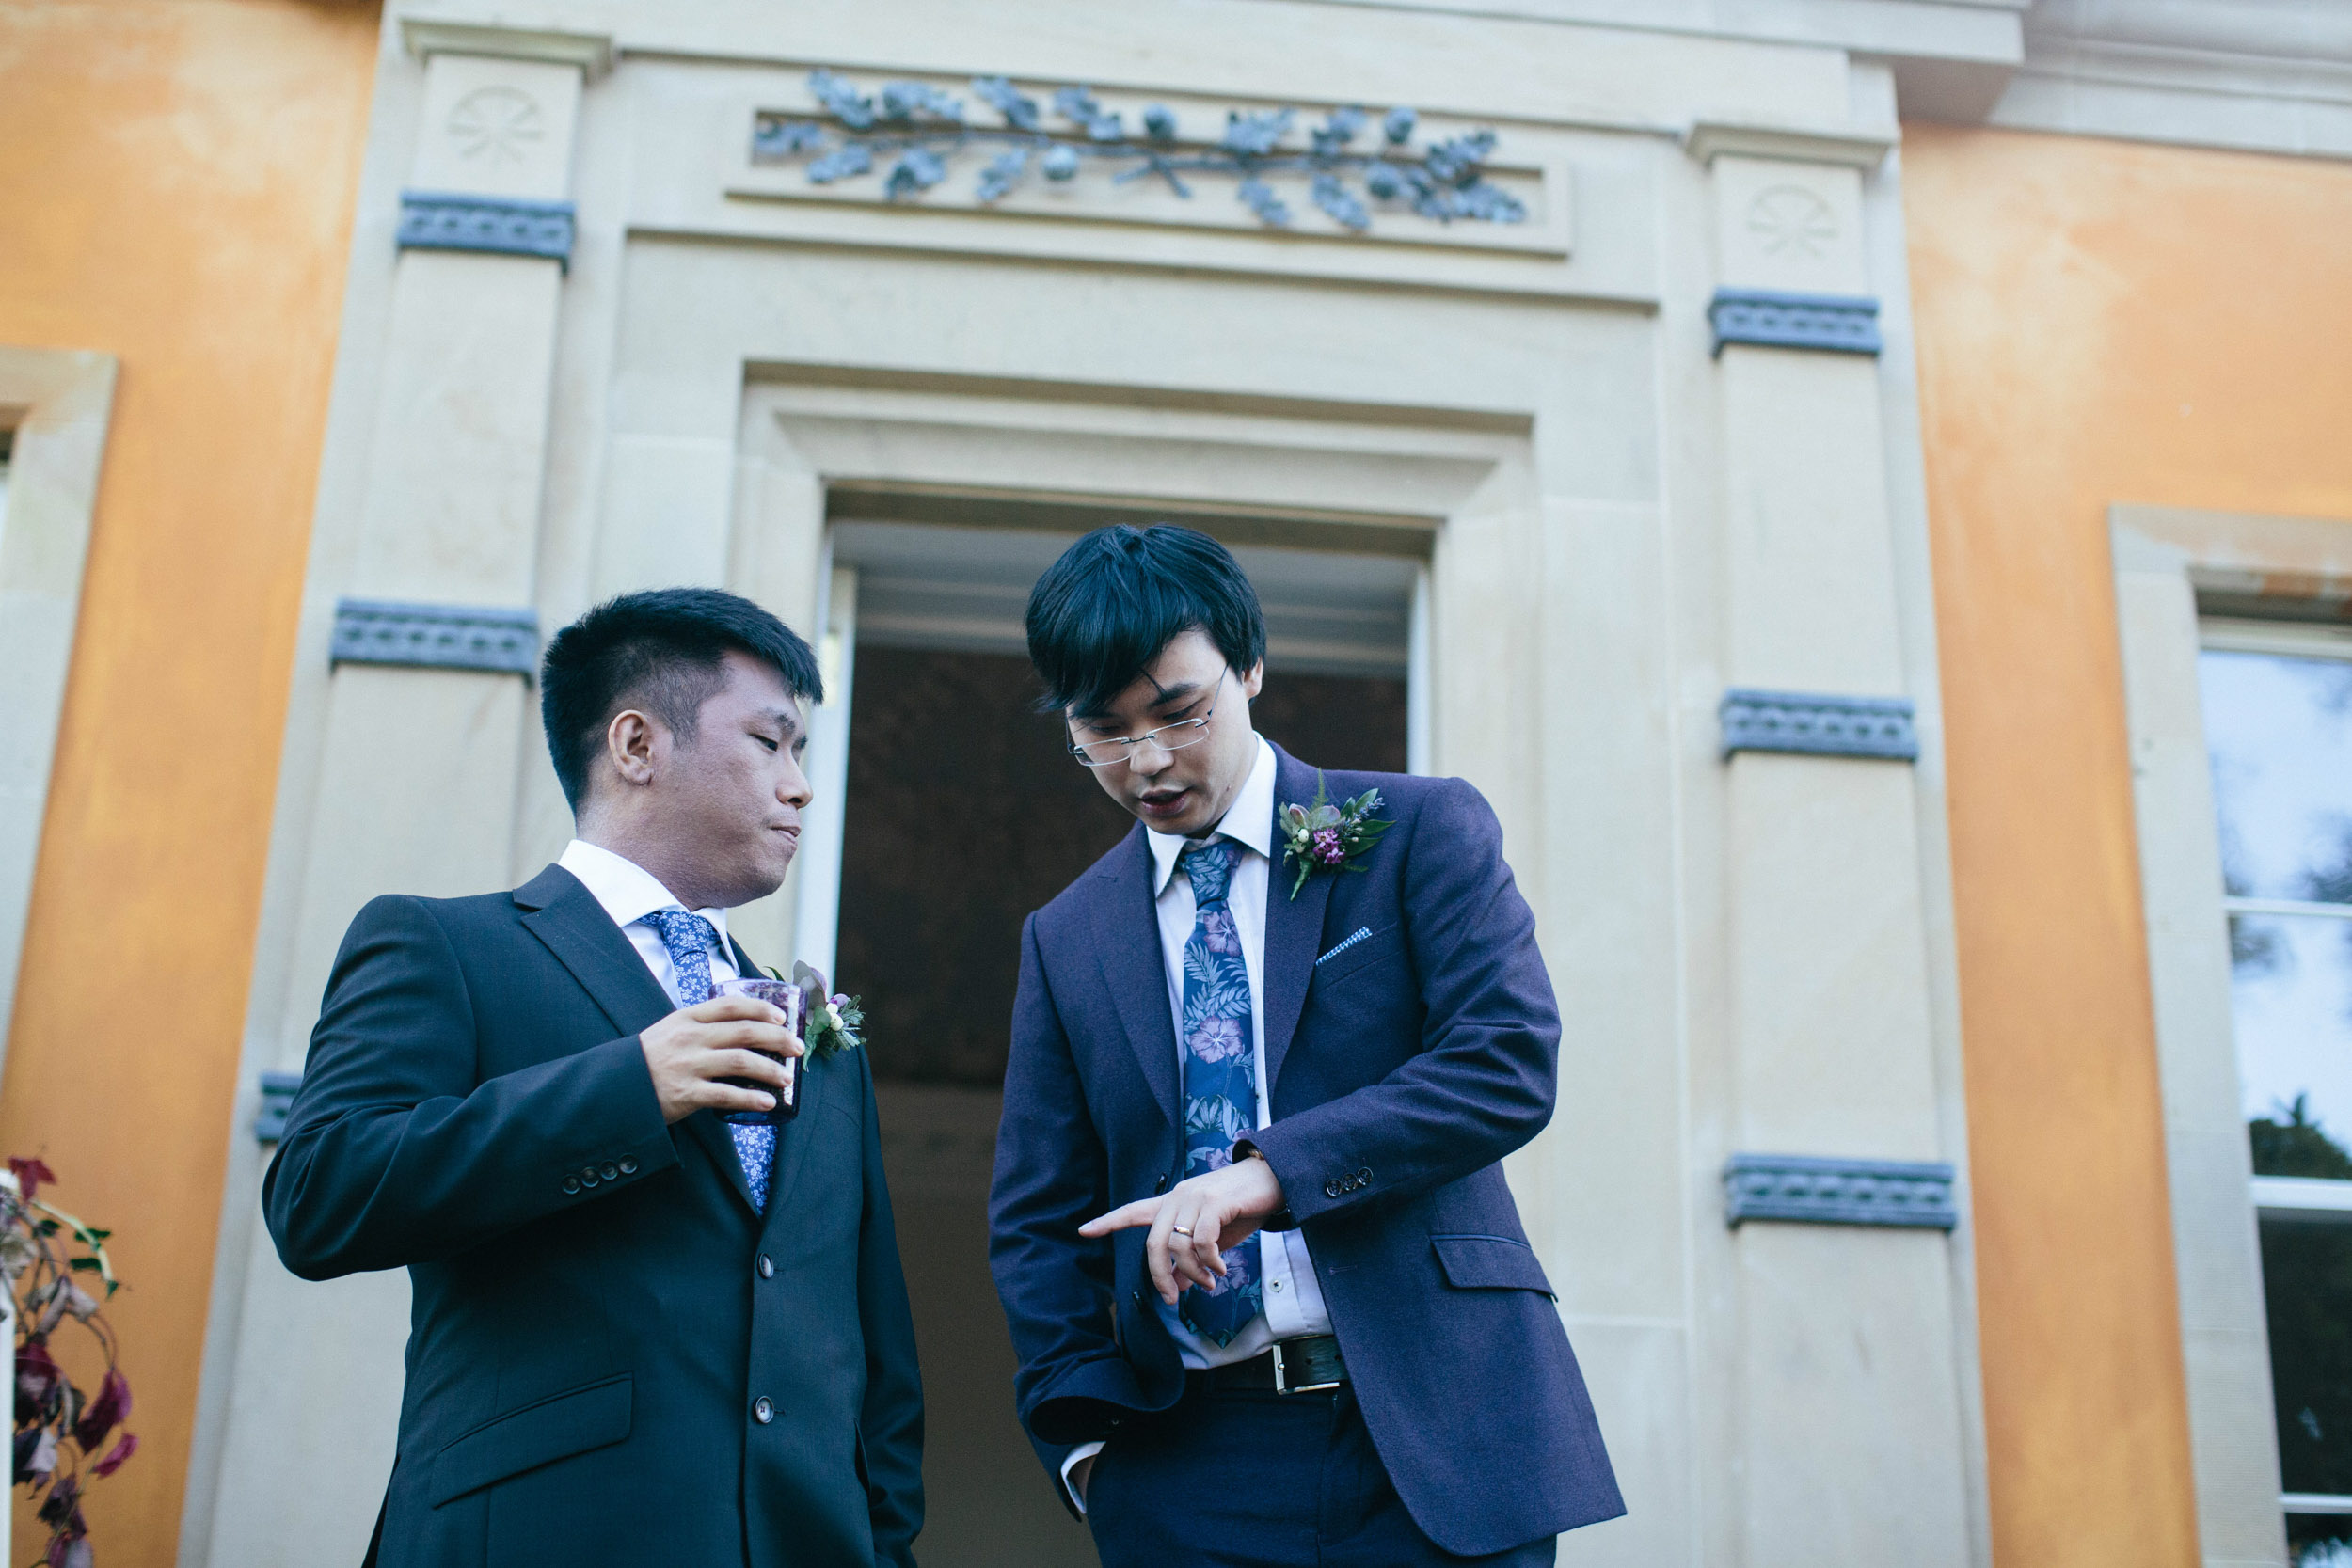 Quirky Wedding Photographer Edinburgh Jupiter Artland -1.jpg